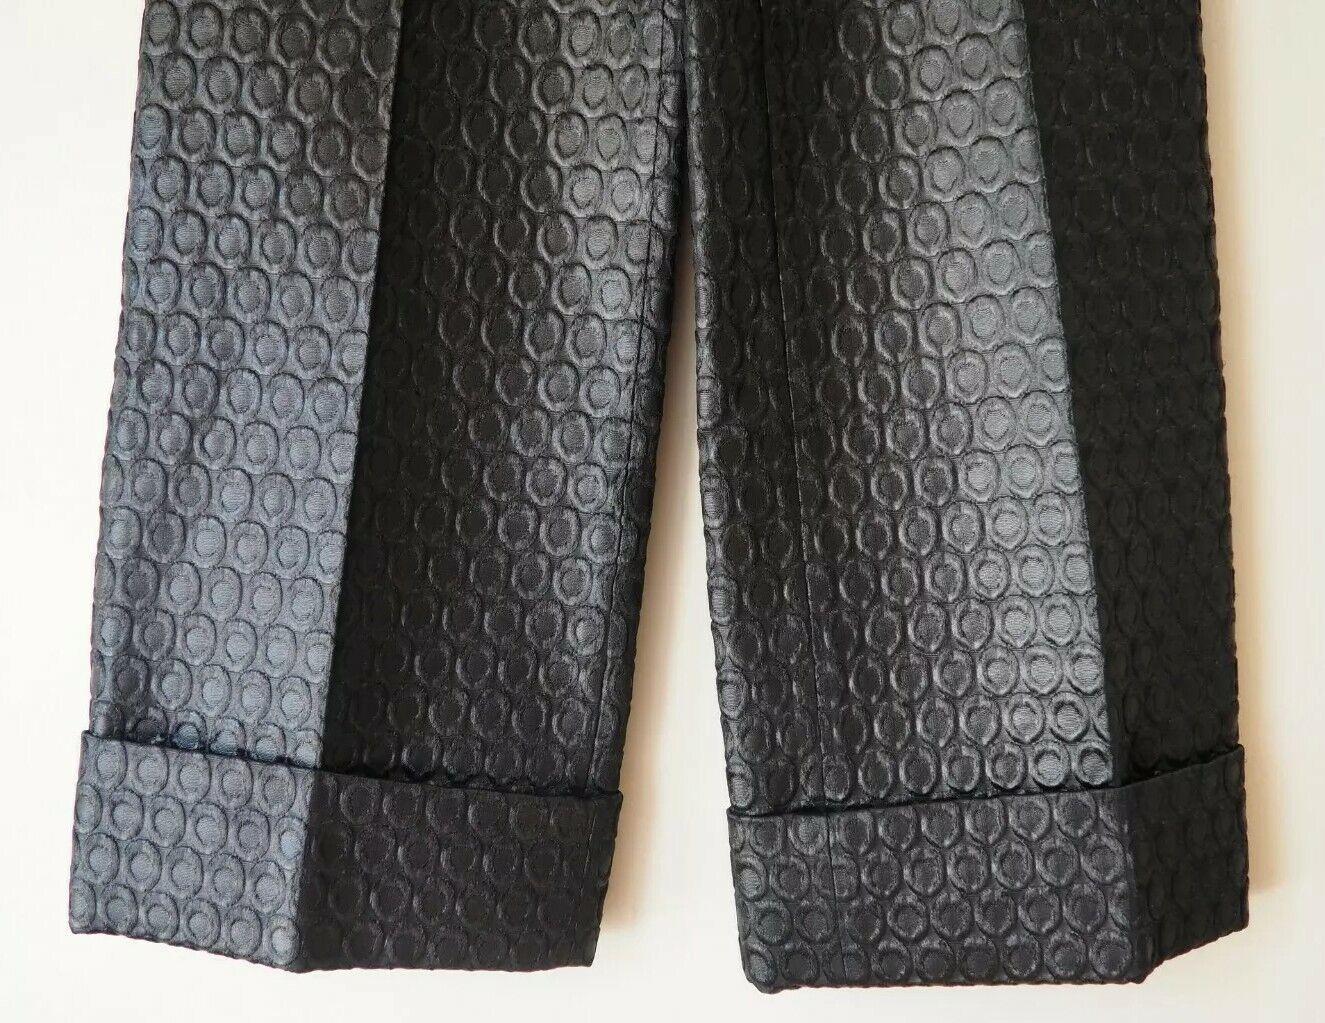 PRADA 1990's Vintage Pants Trousers Circular Desi… - image 3